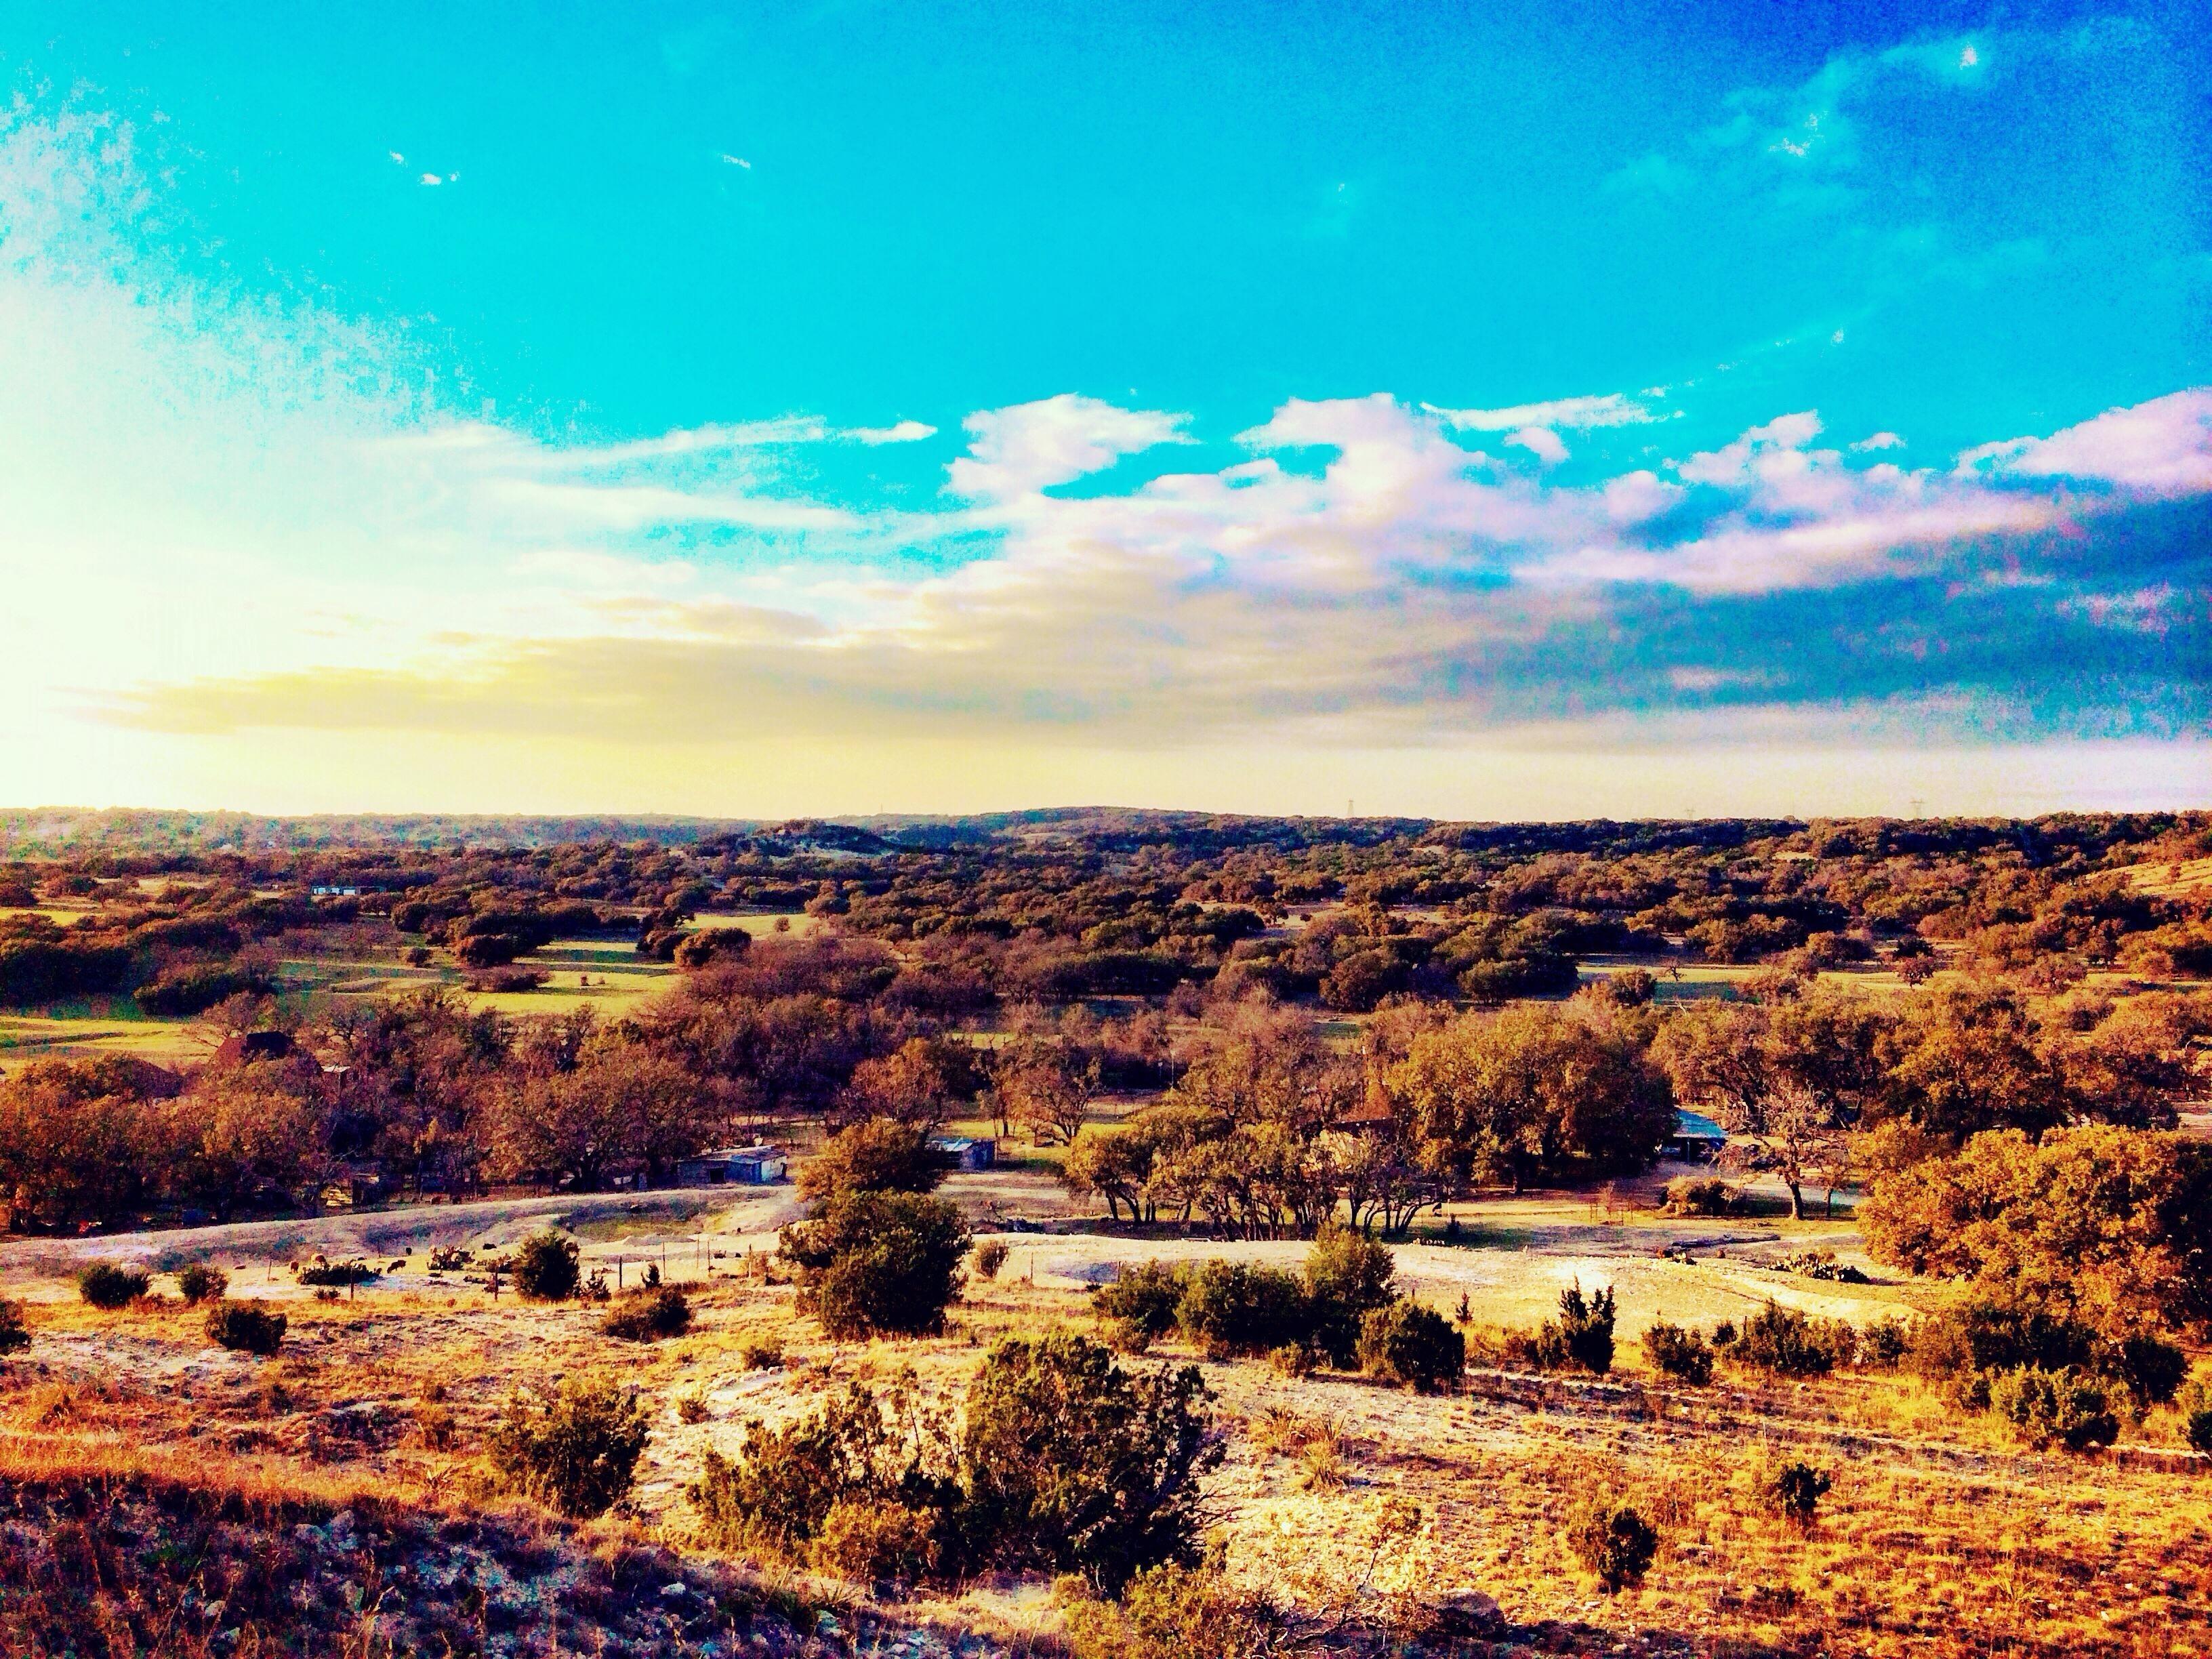 Boerne, Texas, United States of America